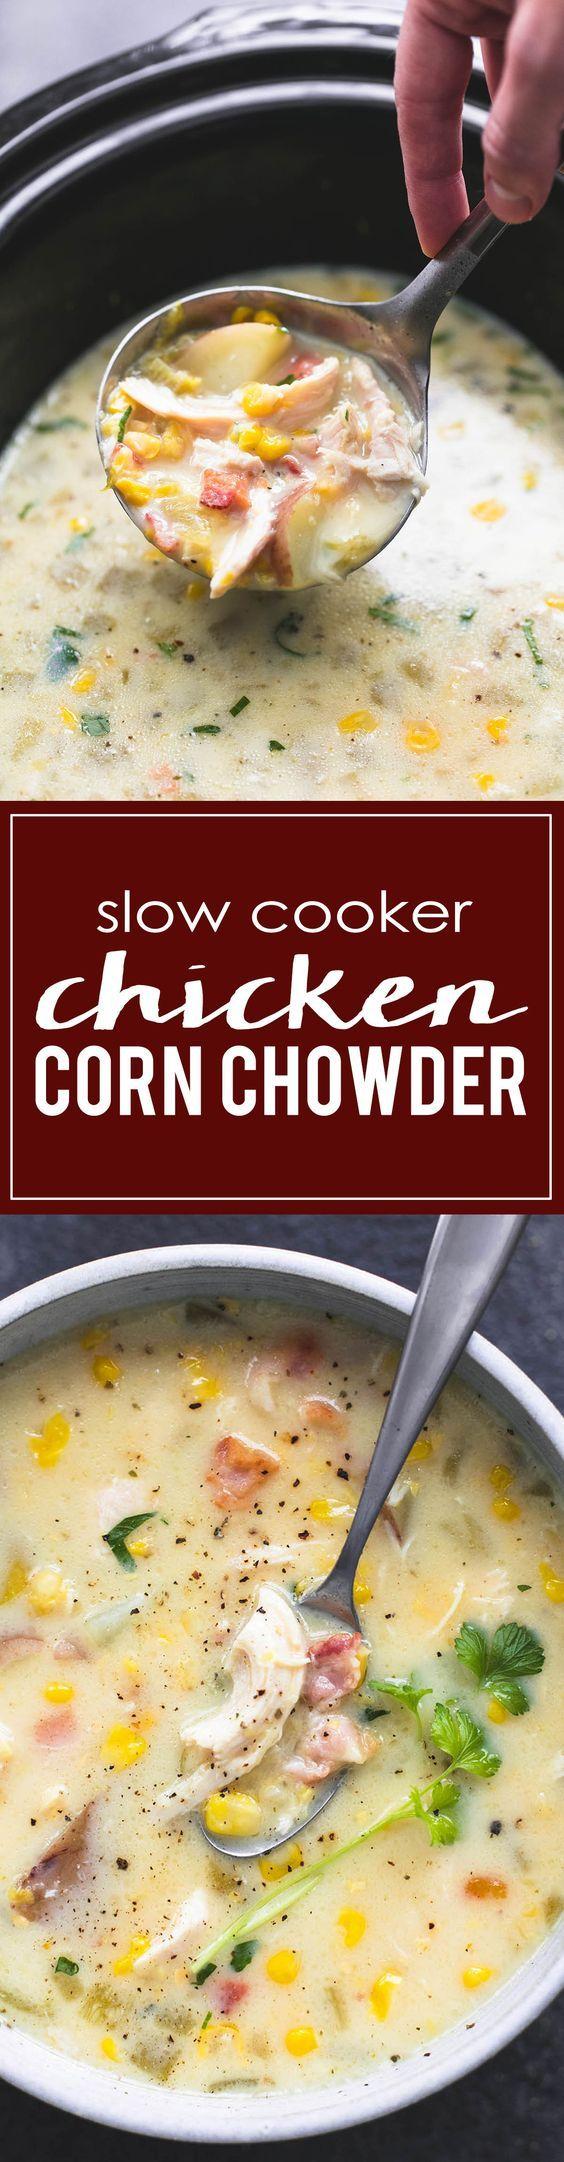 Slow Cooker Chicken Corn Chowder | lecremedelacrumb.com